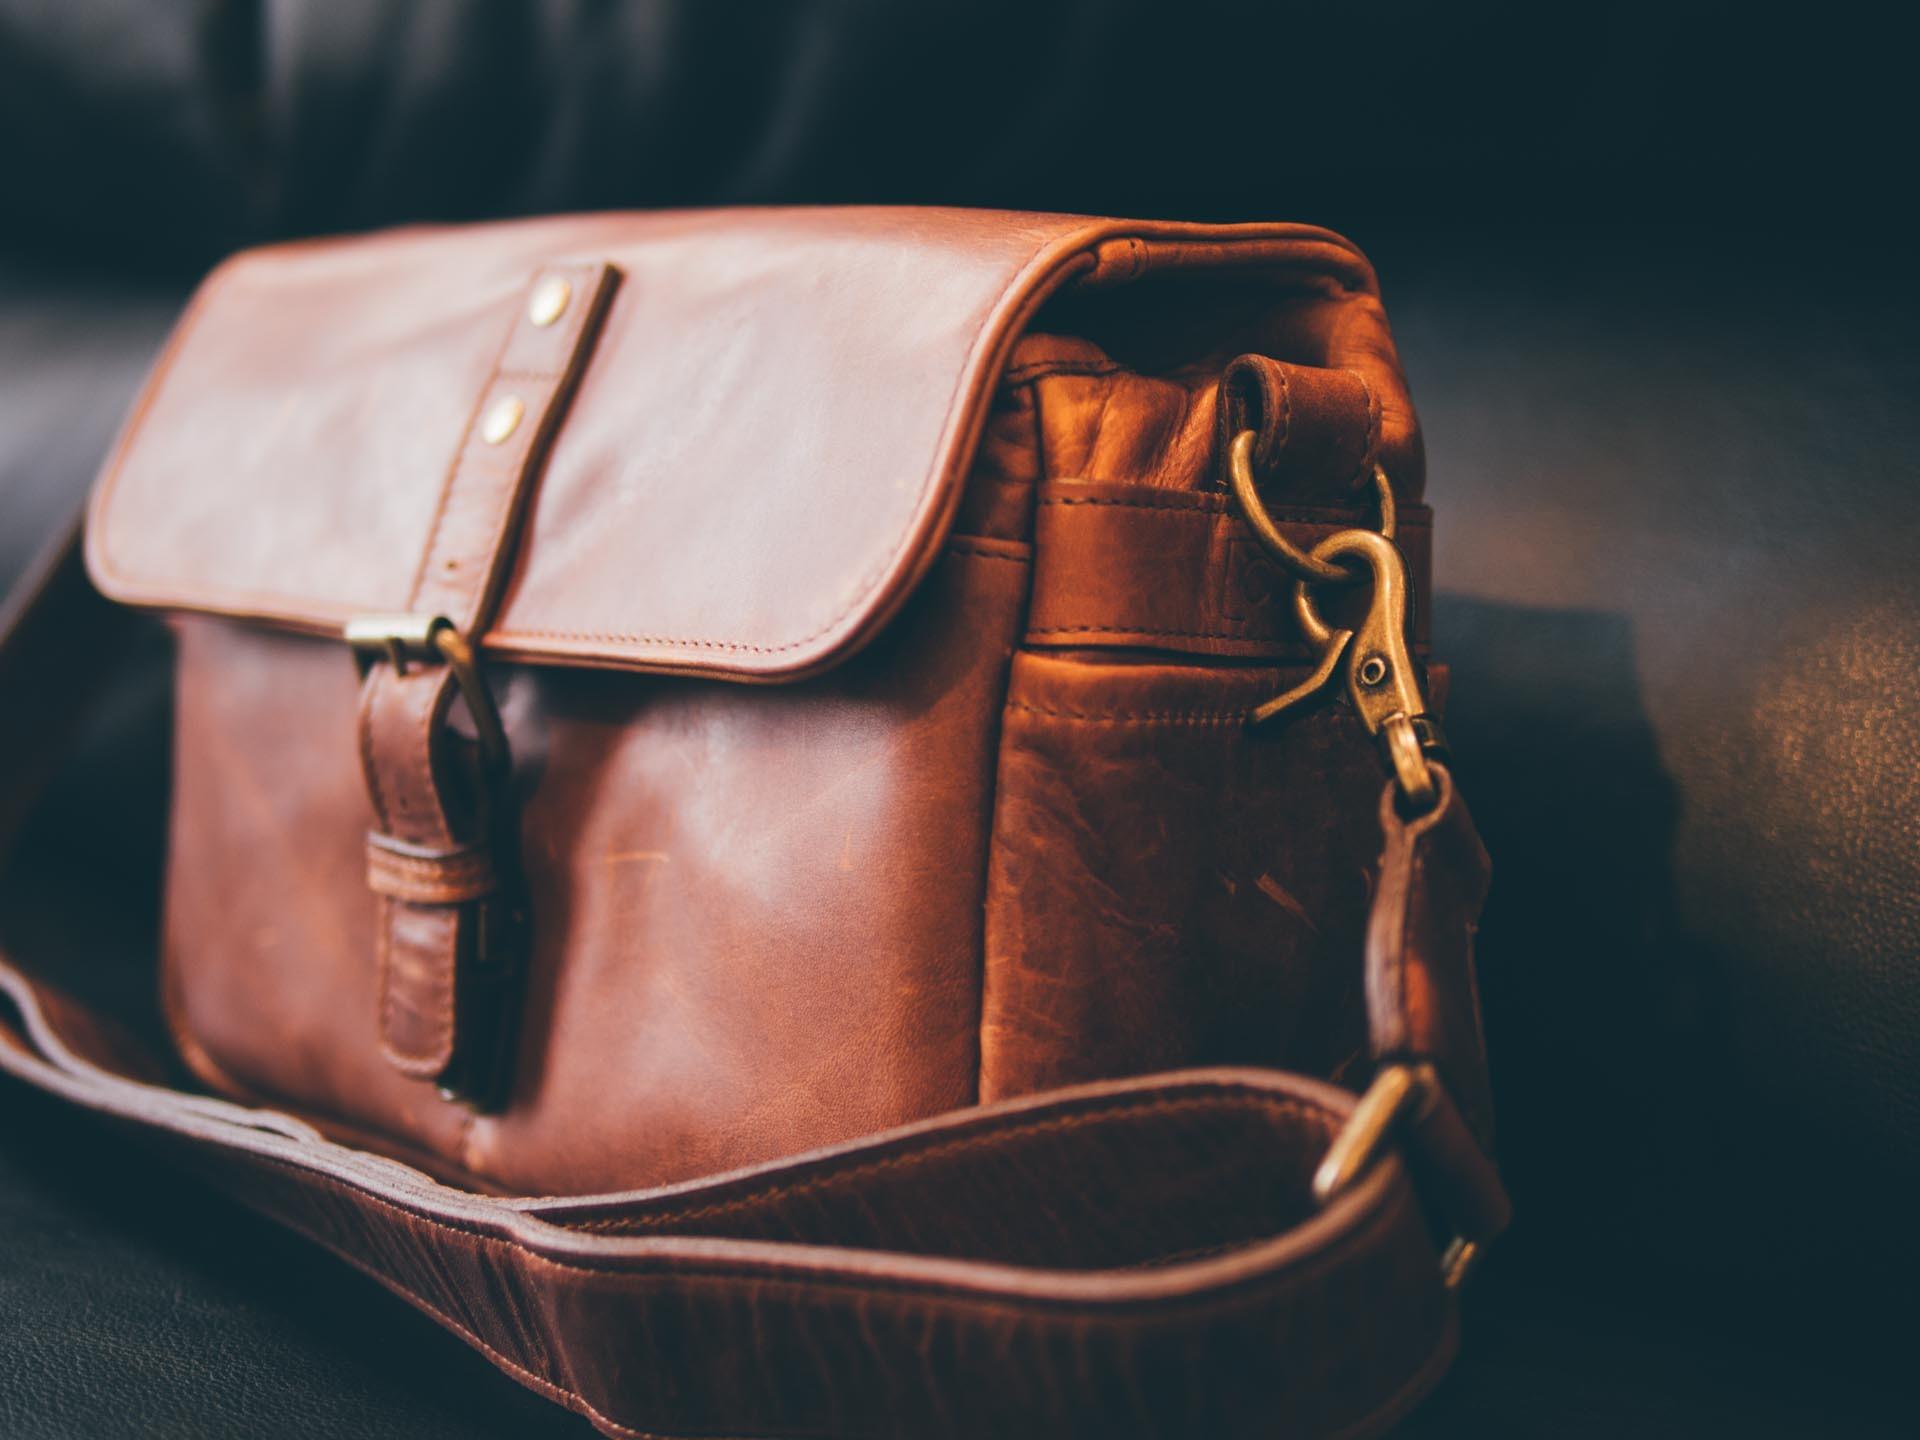 The ONA Bowery camera bag and insert. ($139–$249)